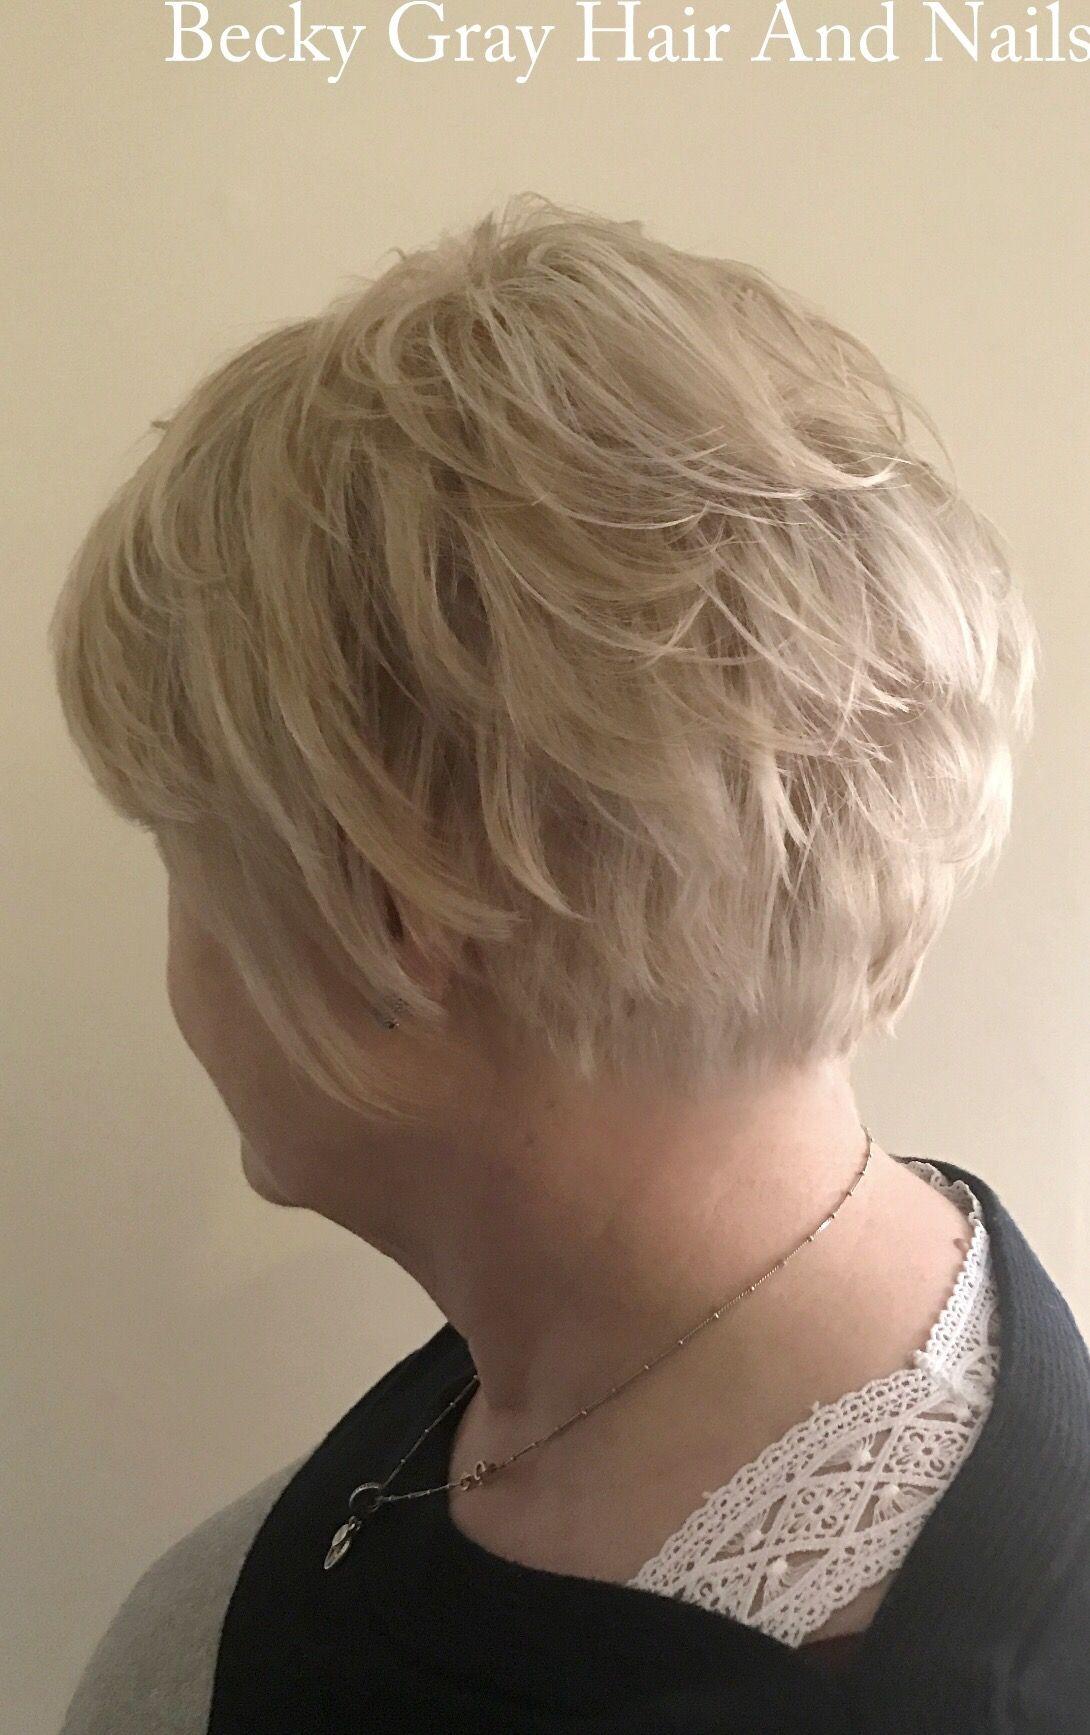 Beautiful #fullheadhighlights #olaplex #wella #highlights #blondor #wellaprofessional #hairdresser #mobilehairdresser